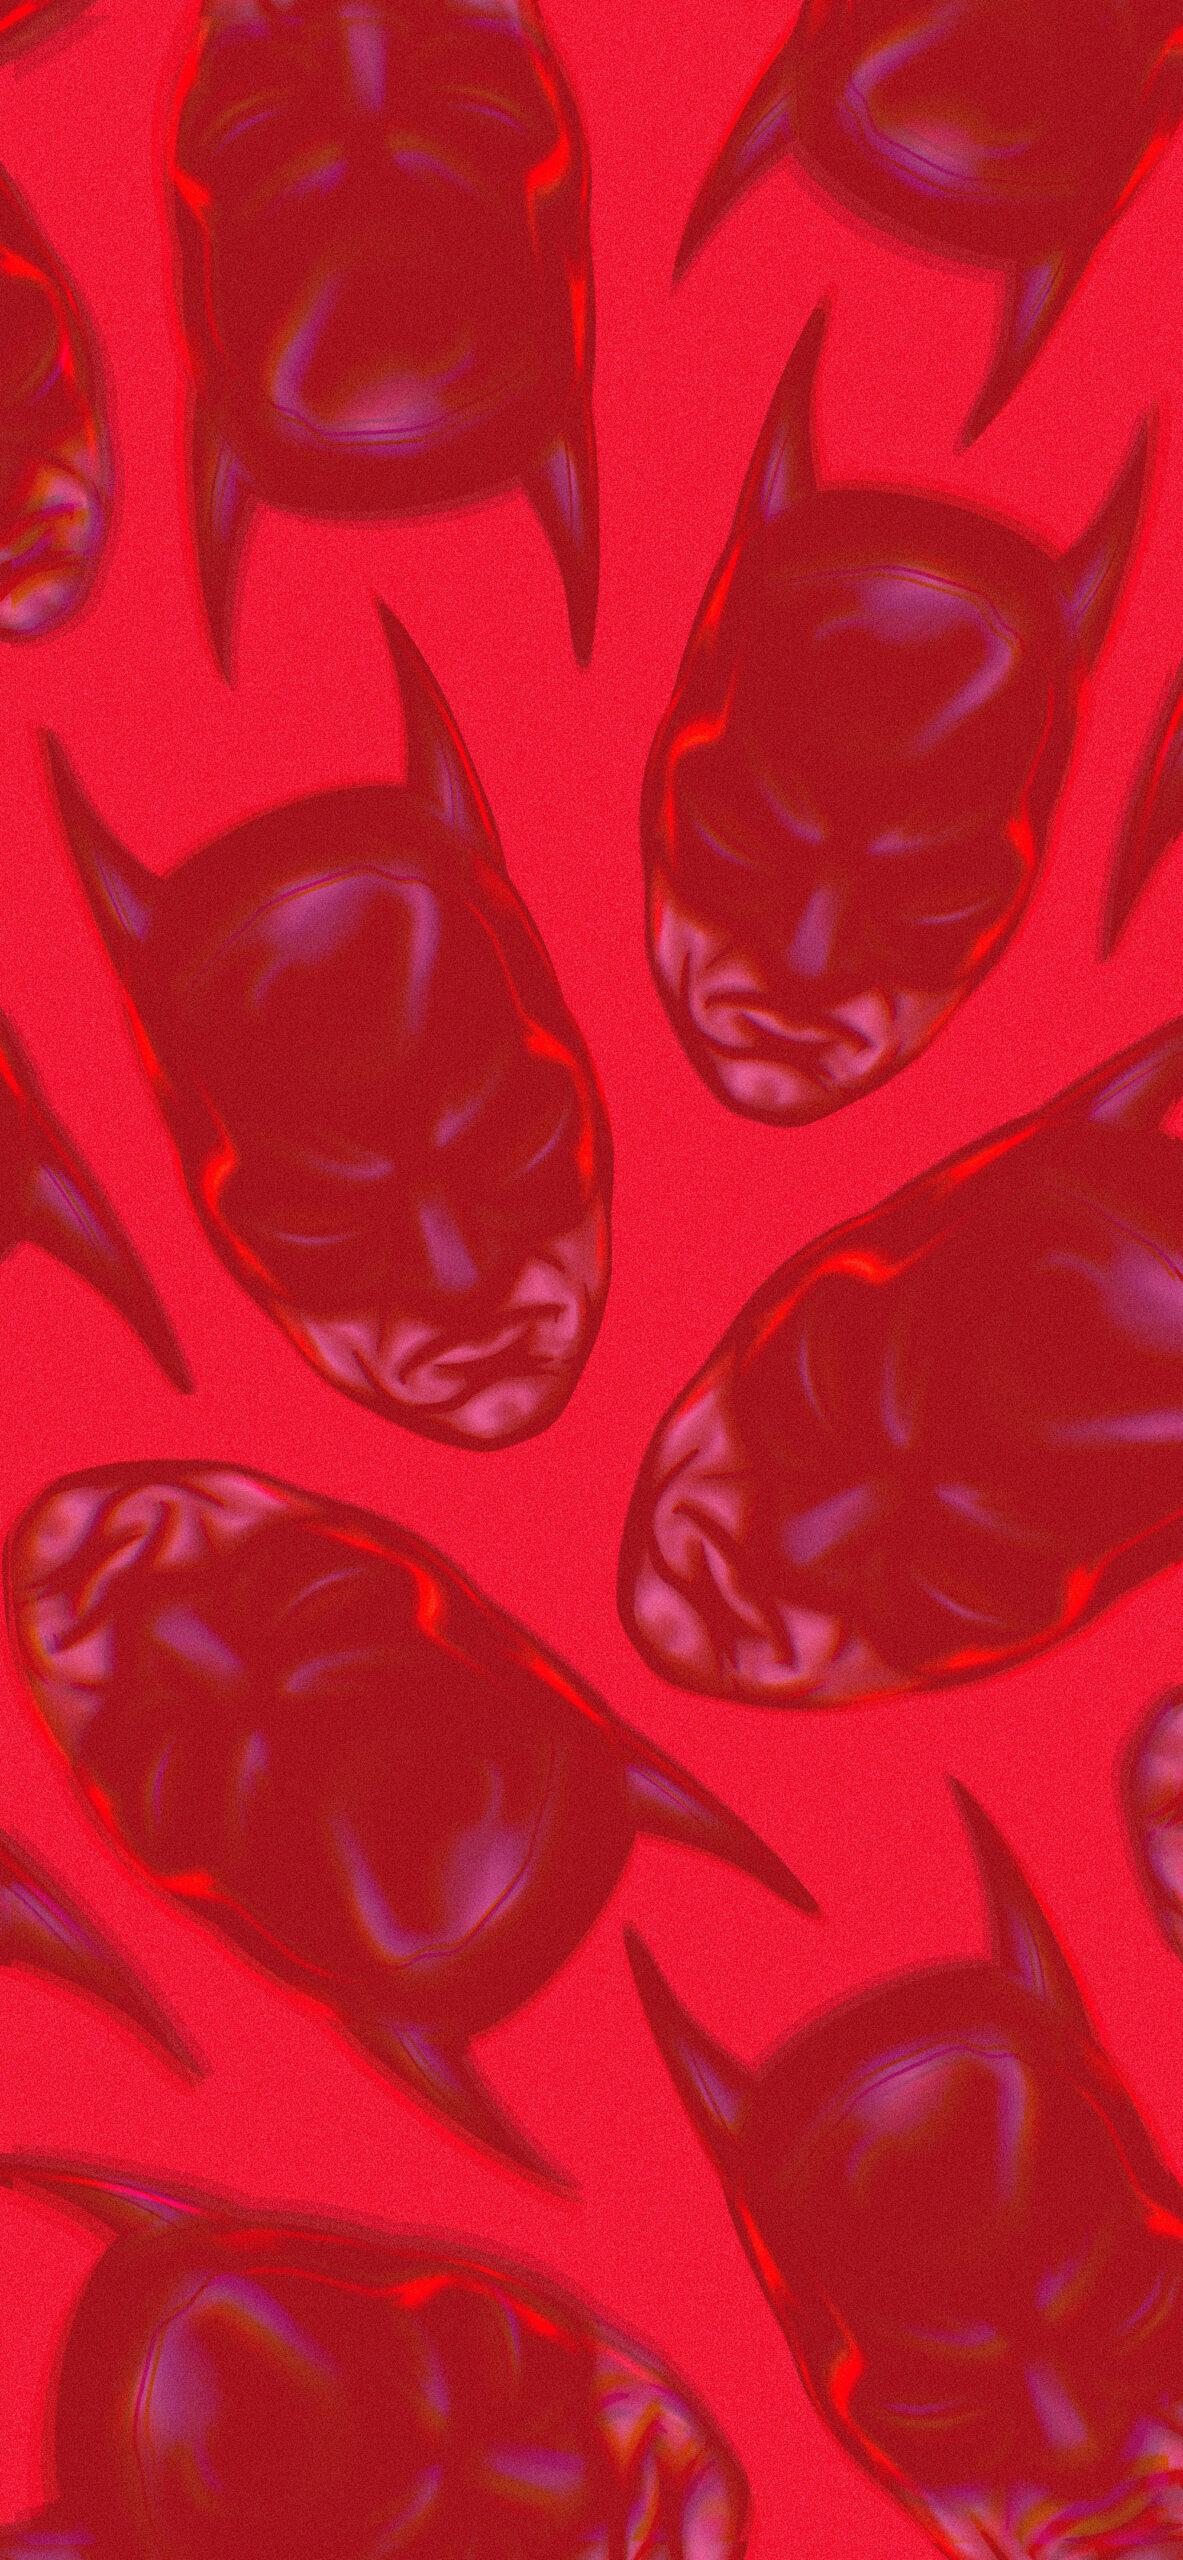 batman pattern red background